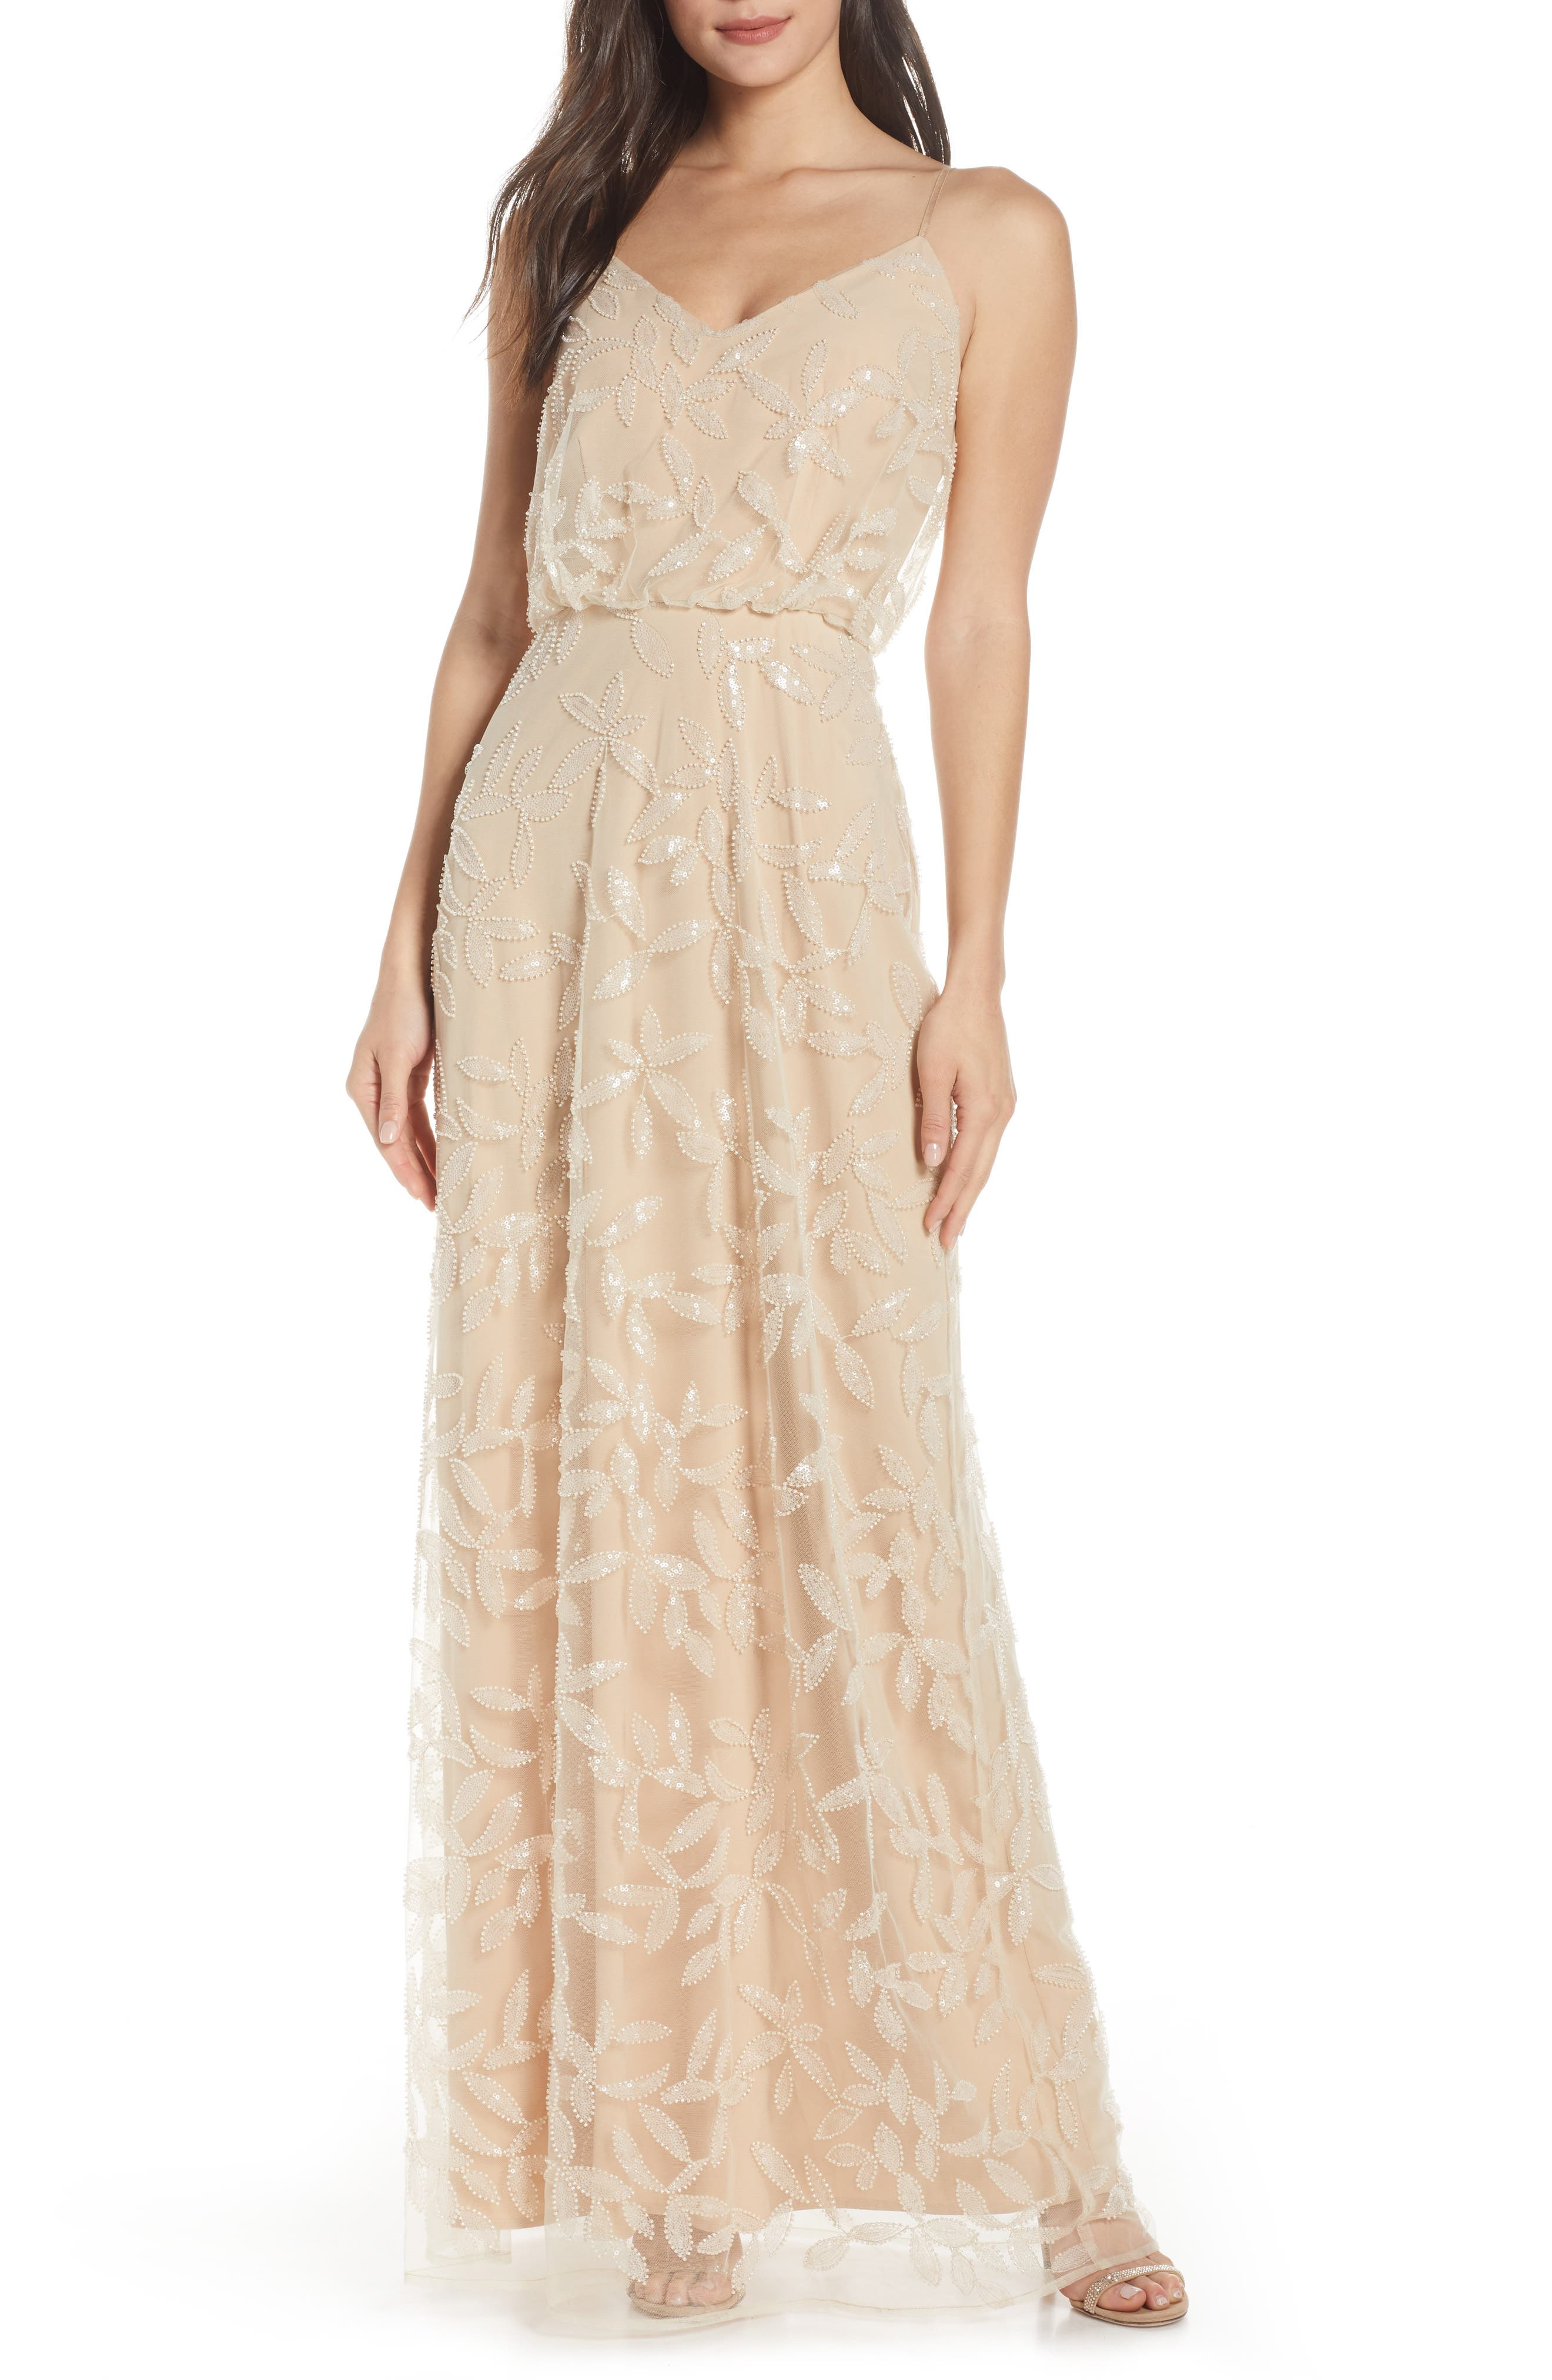 Wayf The Savannah Blouson Beaded Mesh Evening Dress, Beige